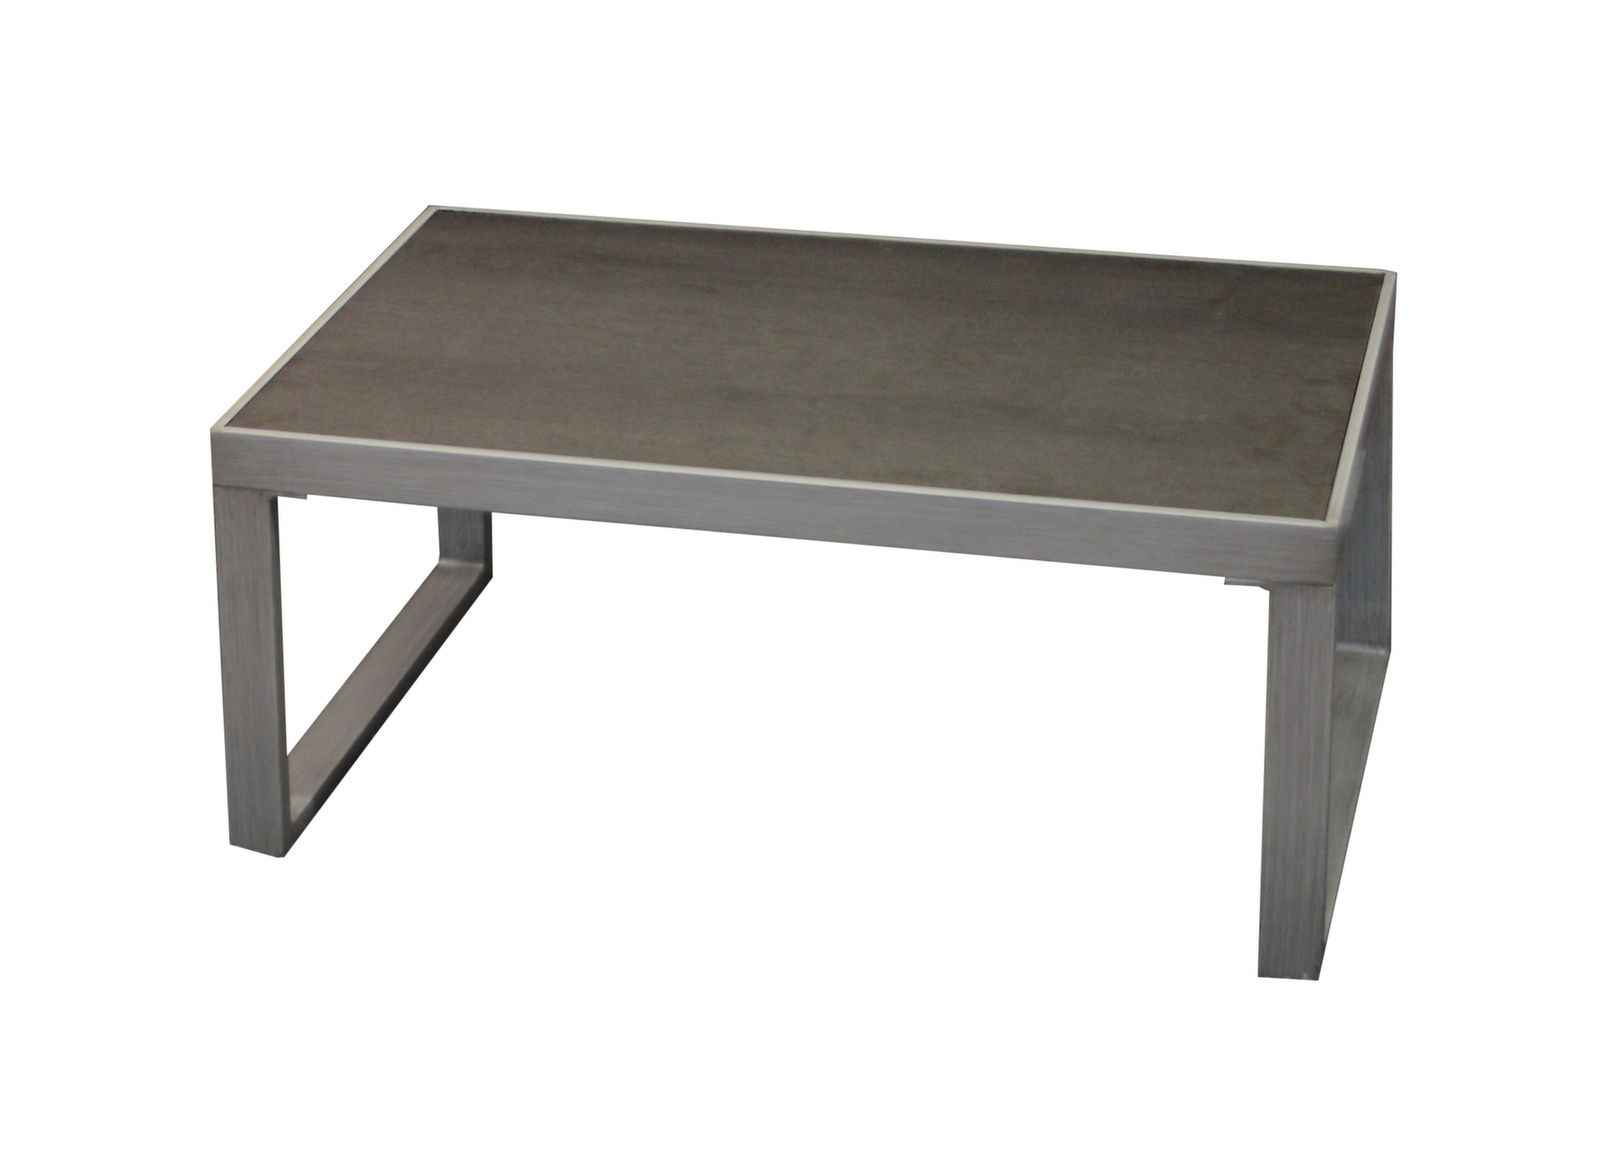 table basse manhattan plateau c ramique tables basses de jardin. Black Bedroom Furniture Sets. Home Design Ideas